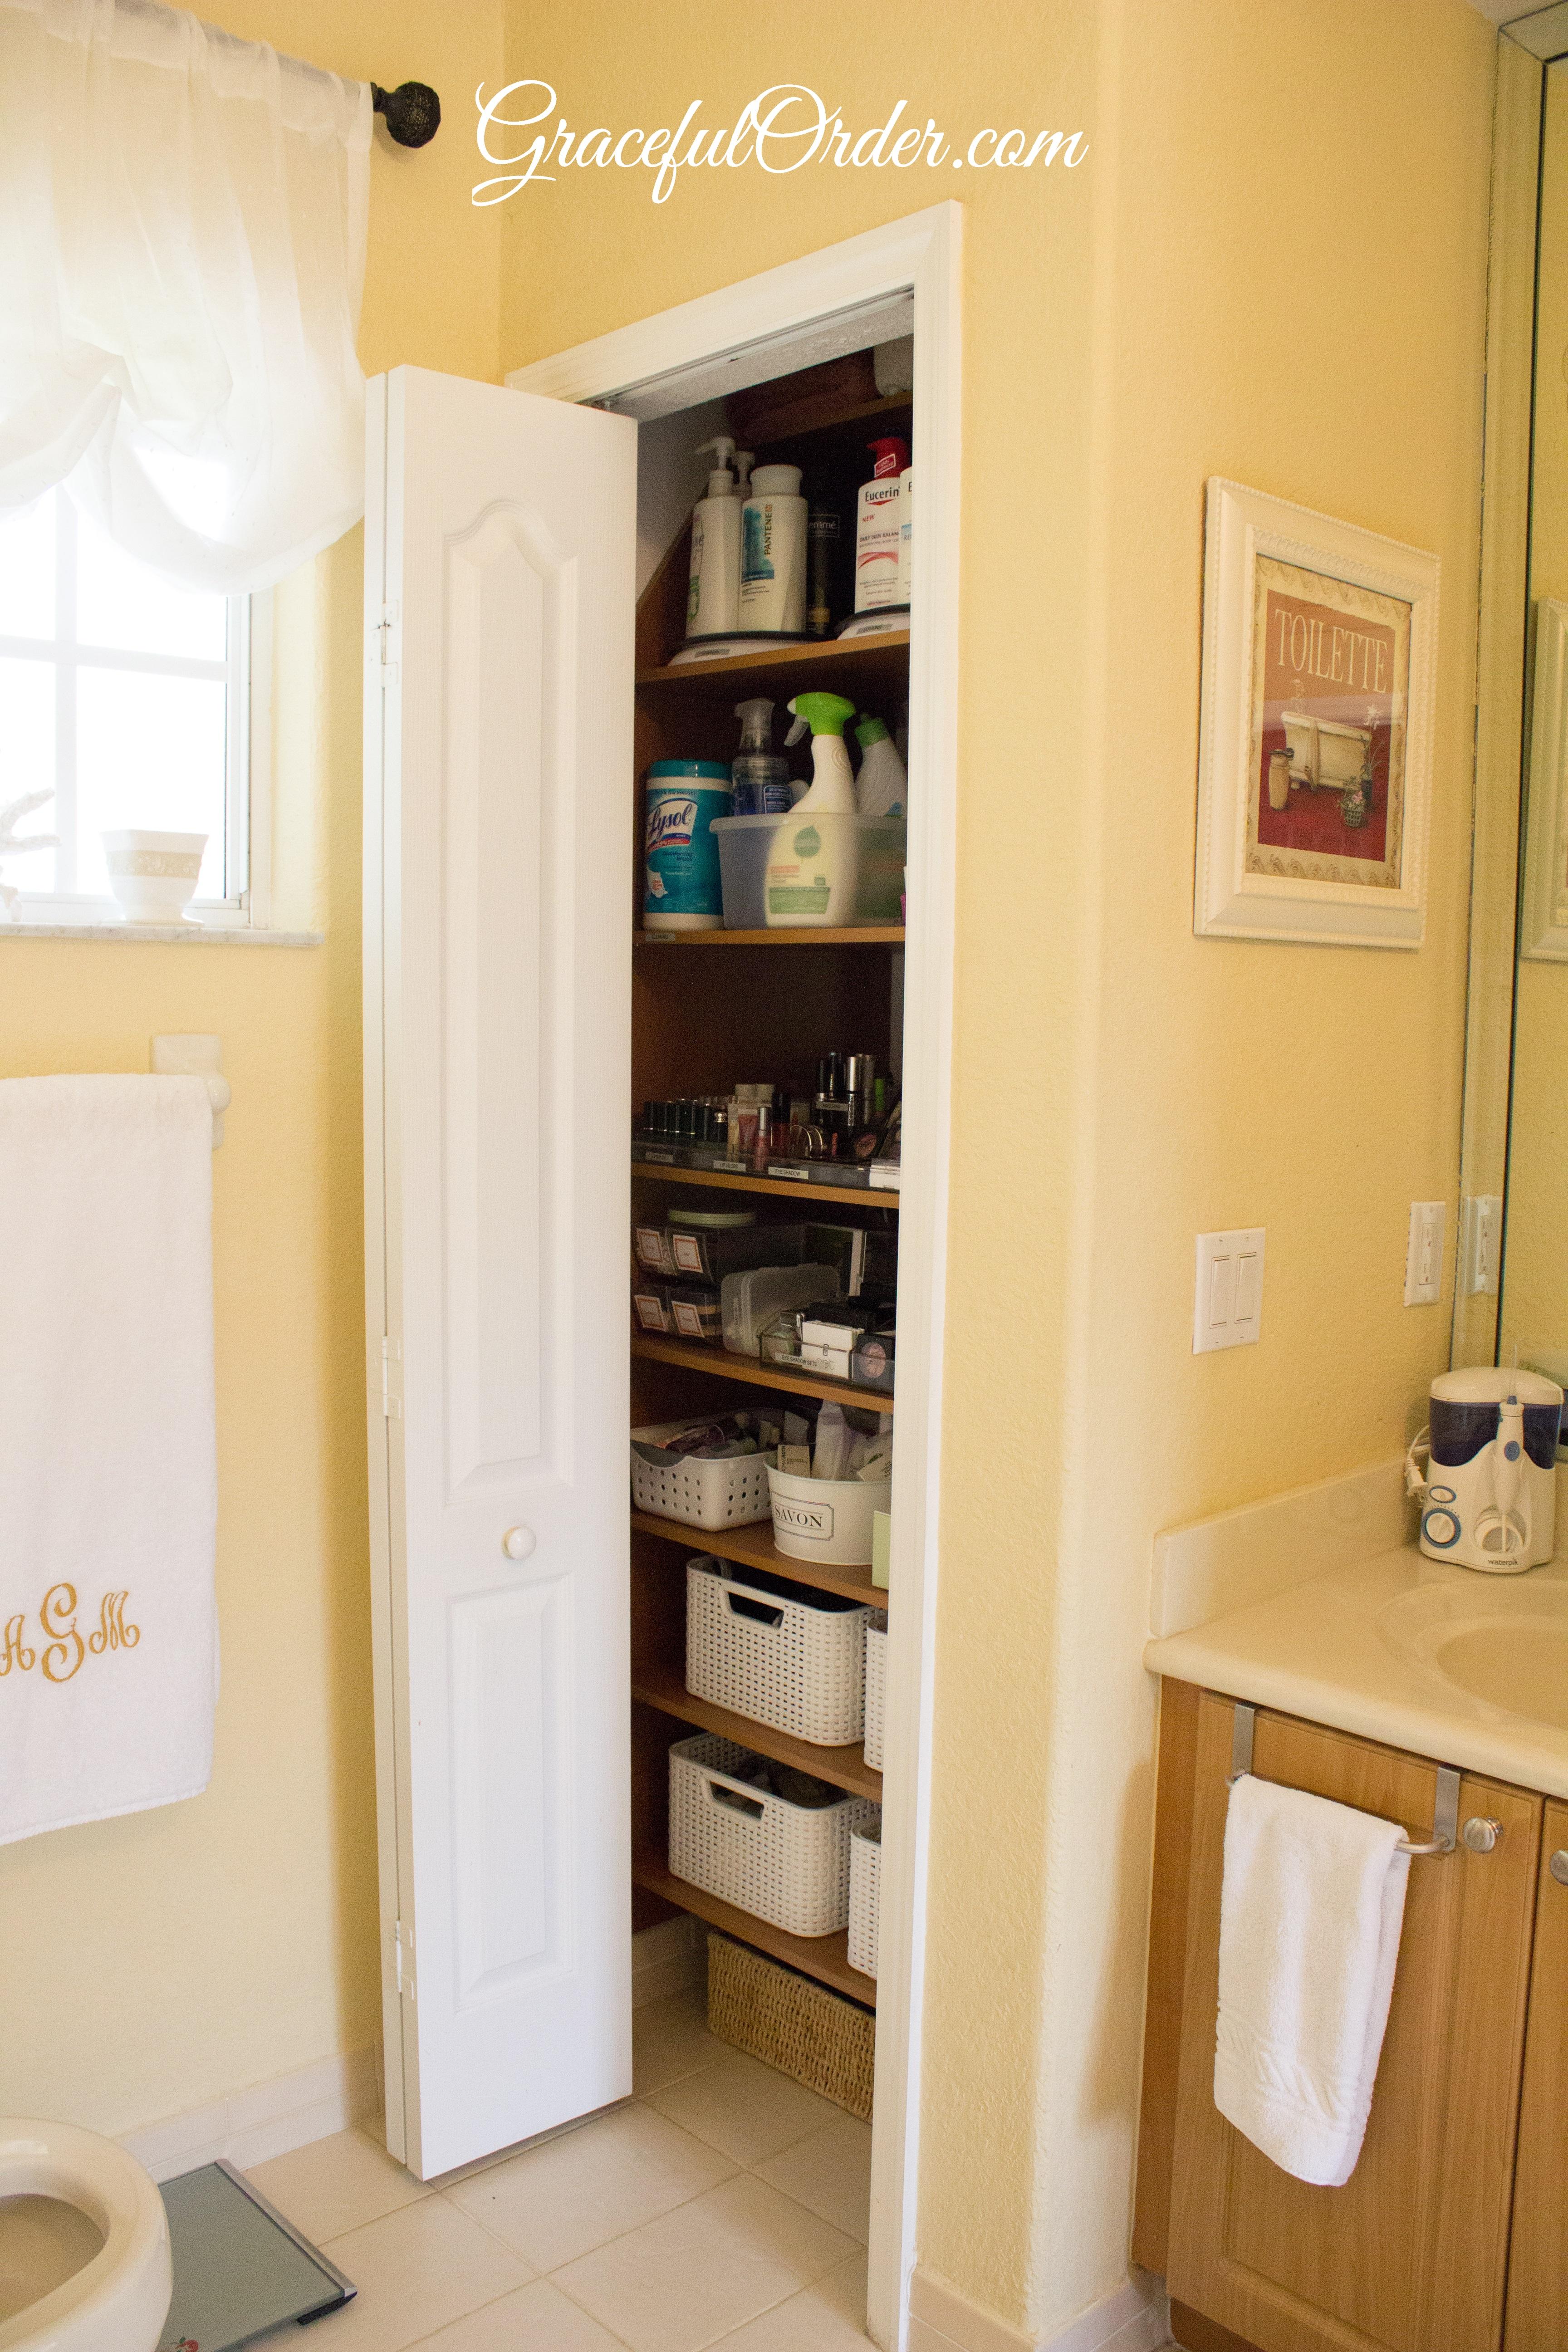 Bathroom Linen Closet Organization Graceful Order